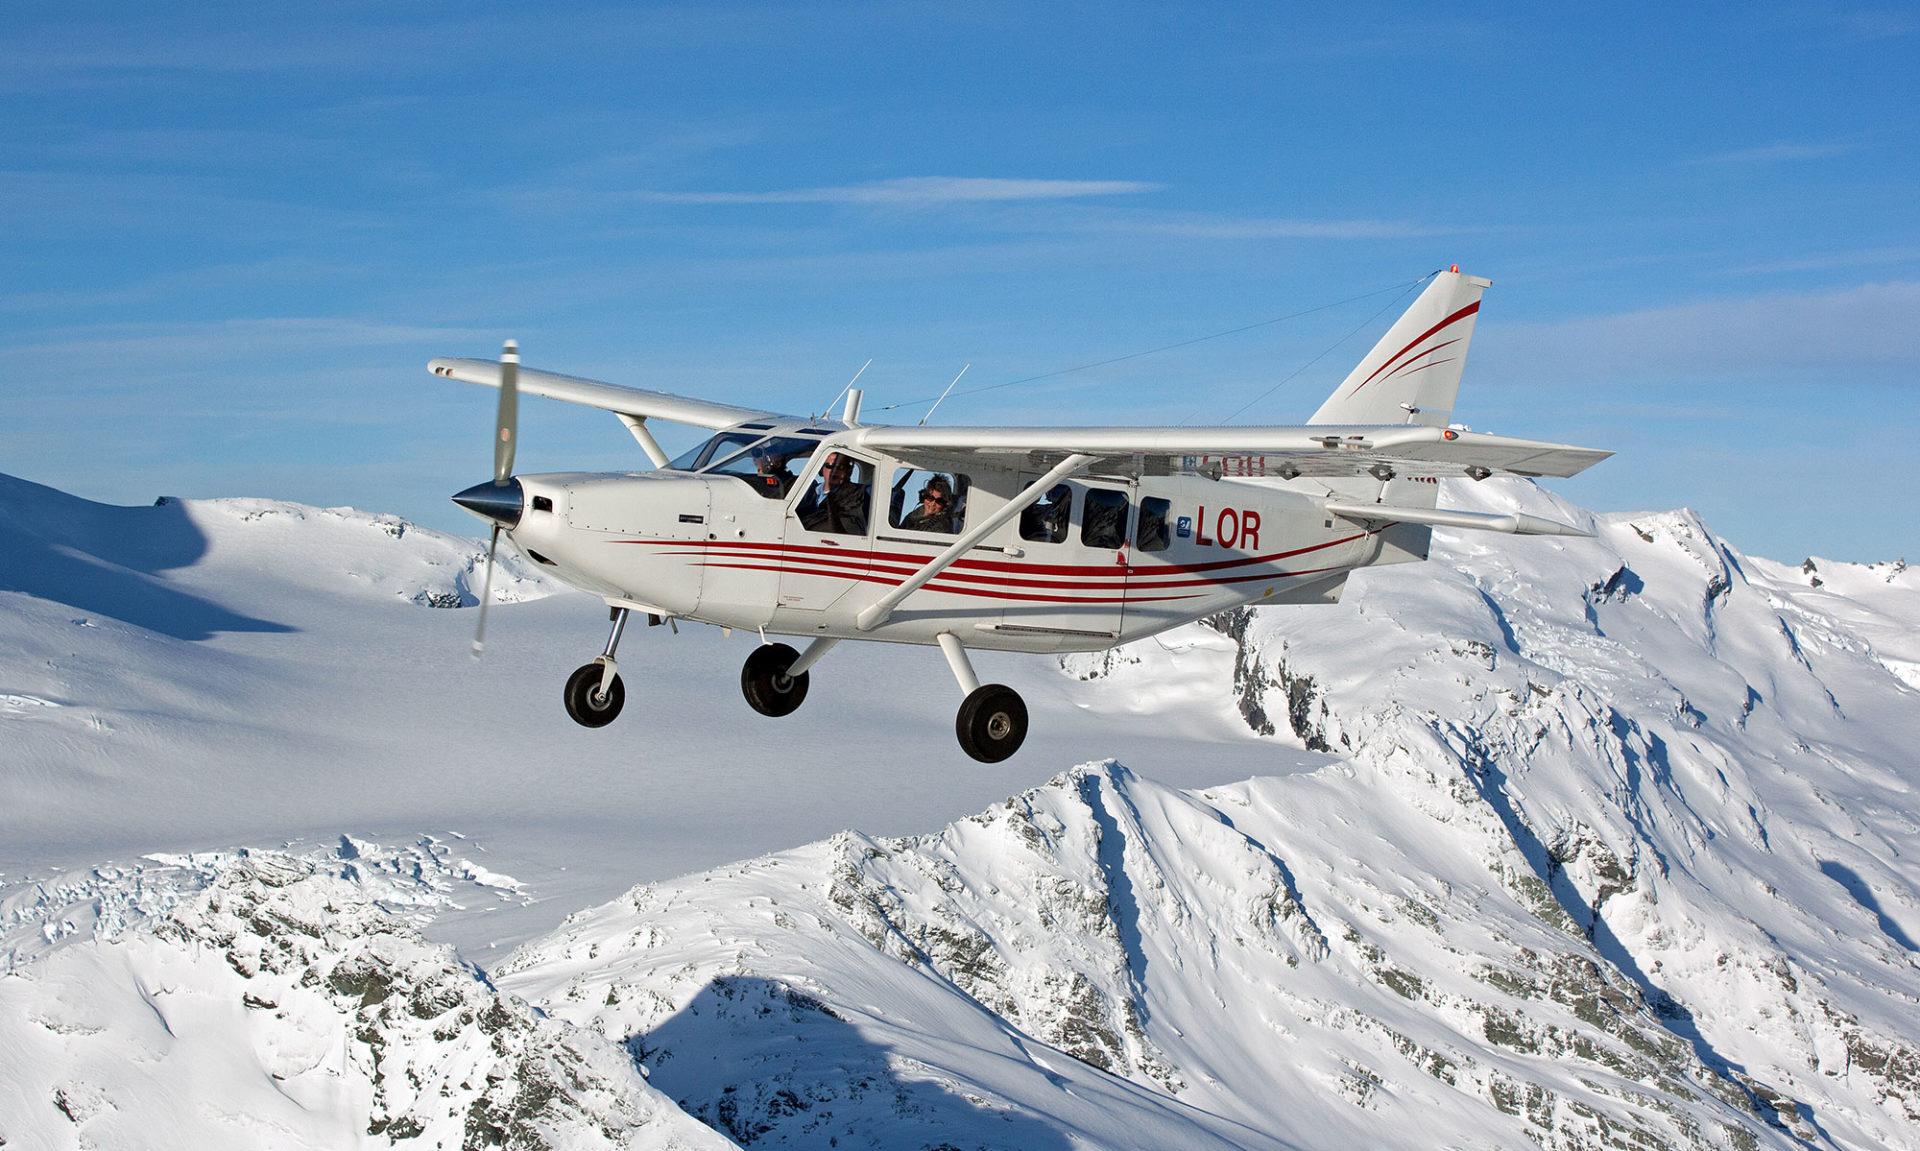 Glenorchy-Air2.jpg